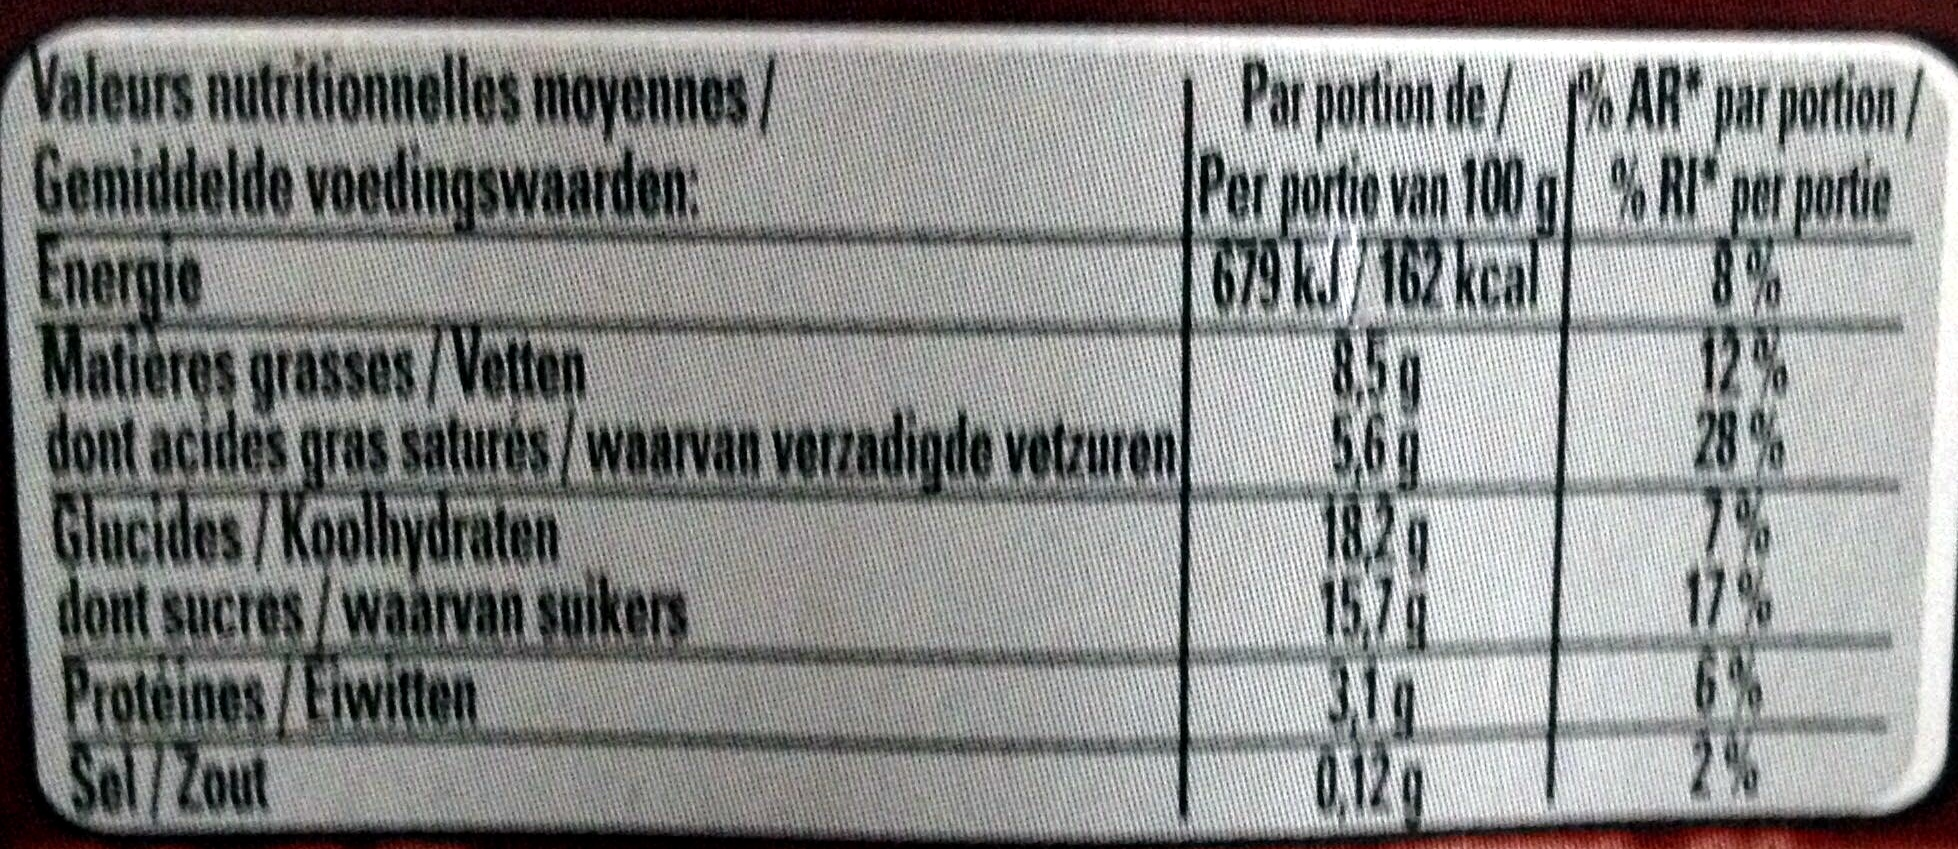 Le Viennois Chocolat (Offre Eco) - Nutrition facts